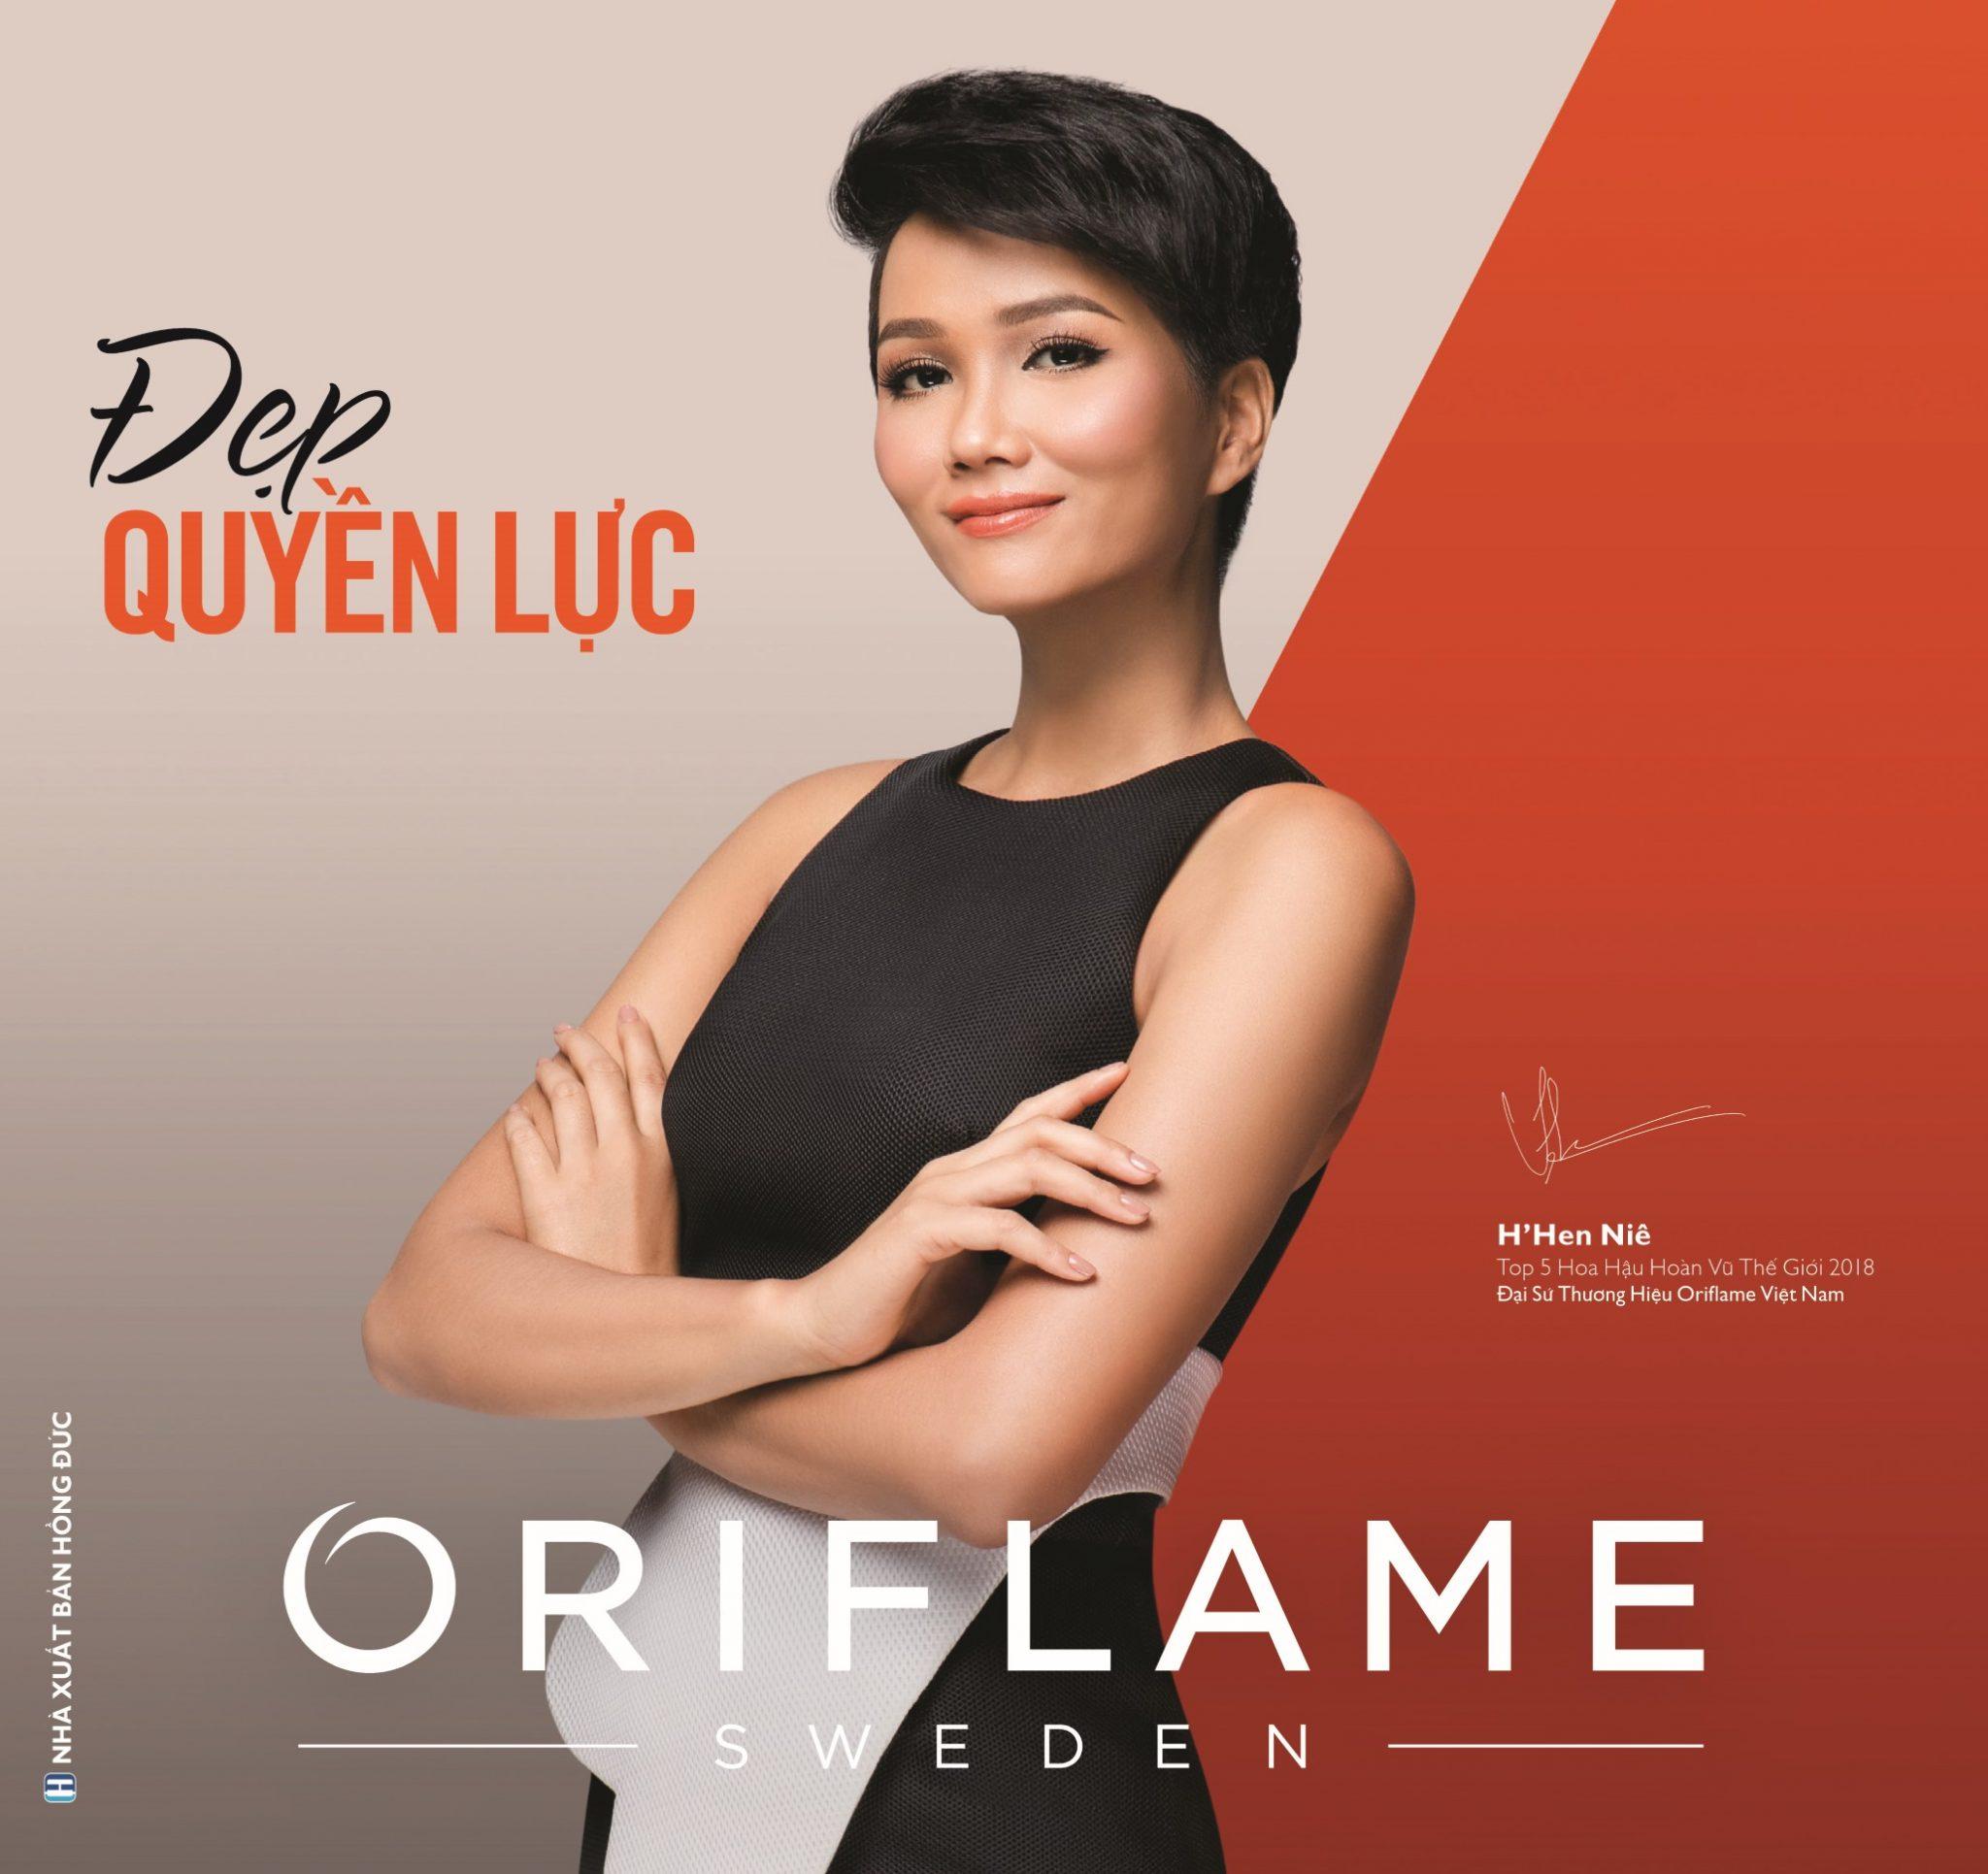 Catalogue mỹ phẩm Oriflame 11-2019